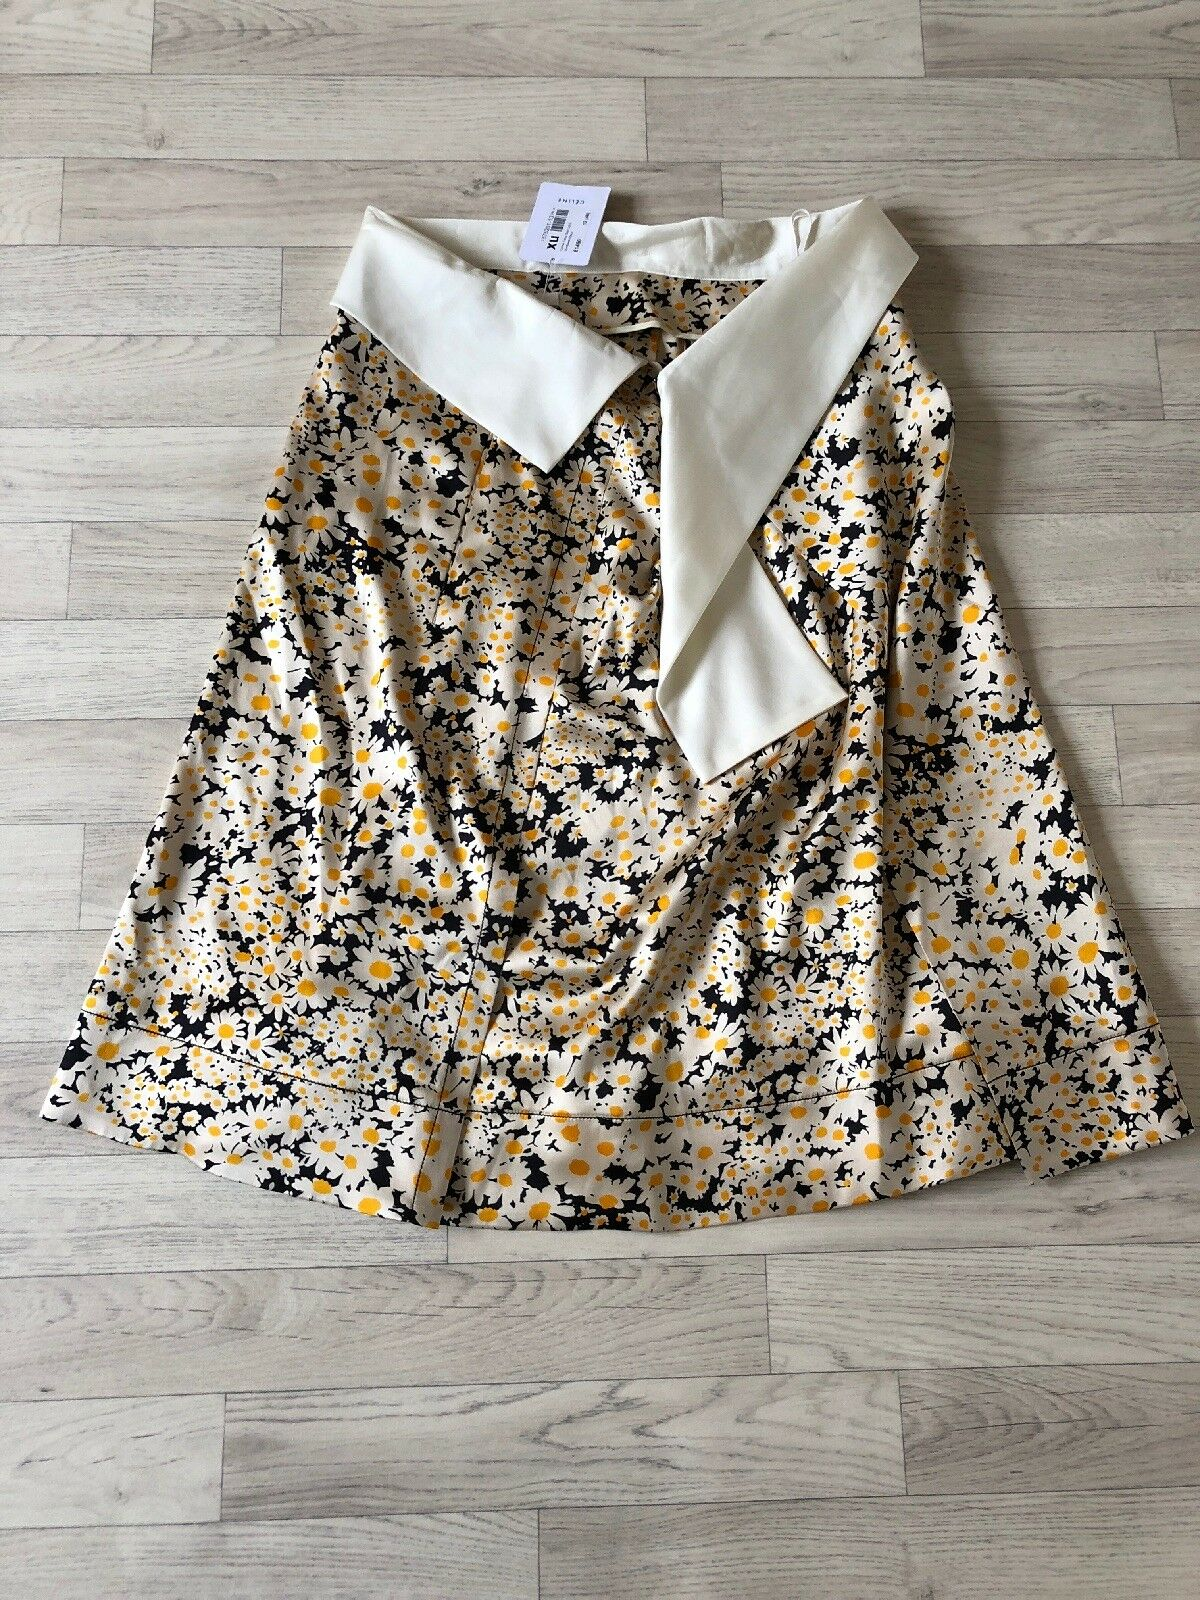 Celine Paris Skirt Celine Silk Floral Diasy A line Skirt UK12 EU40